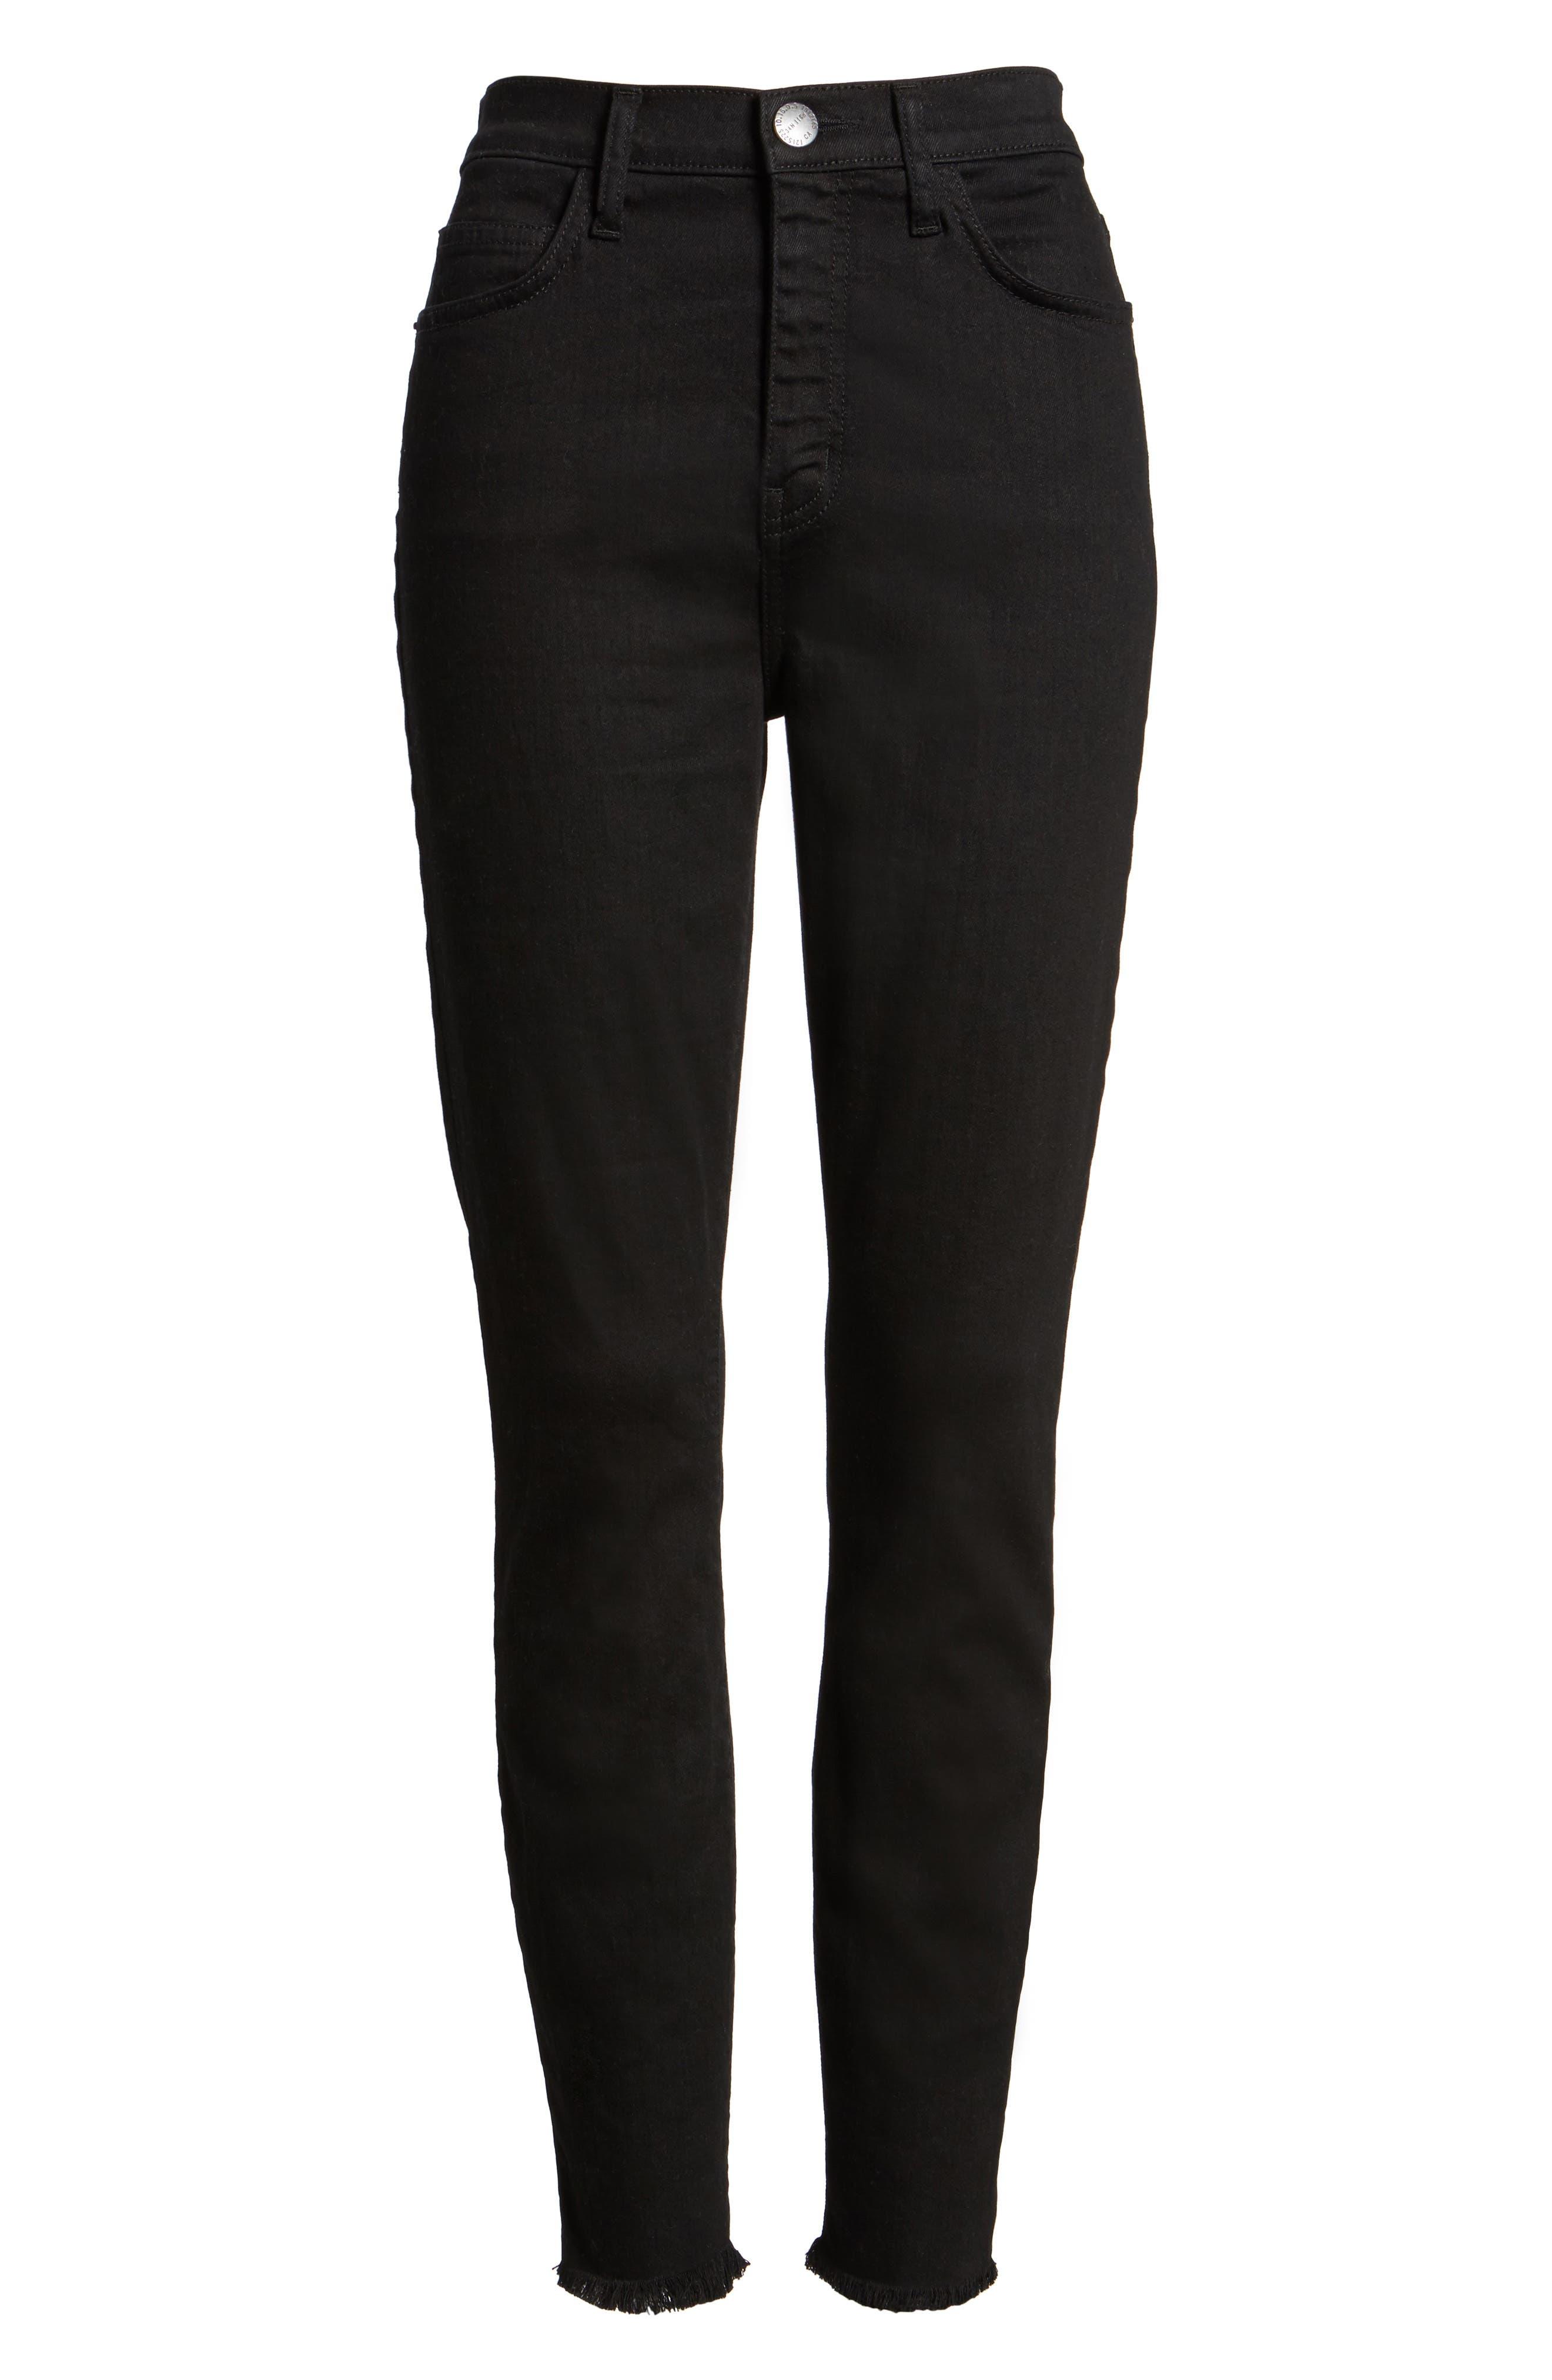 The Super High Waist Stiletto Ankle Skinny Jeans,                             Alternate thumbnail 6, color,                             Jet Black